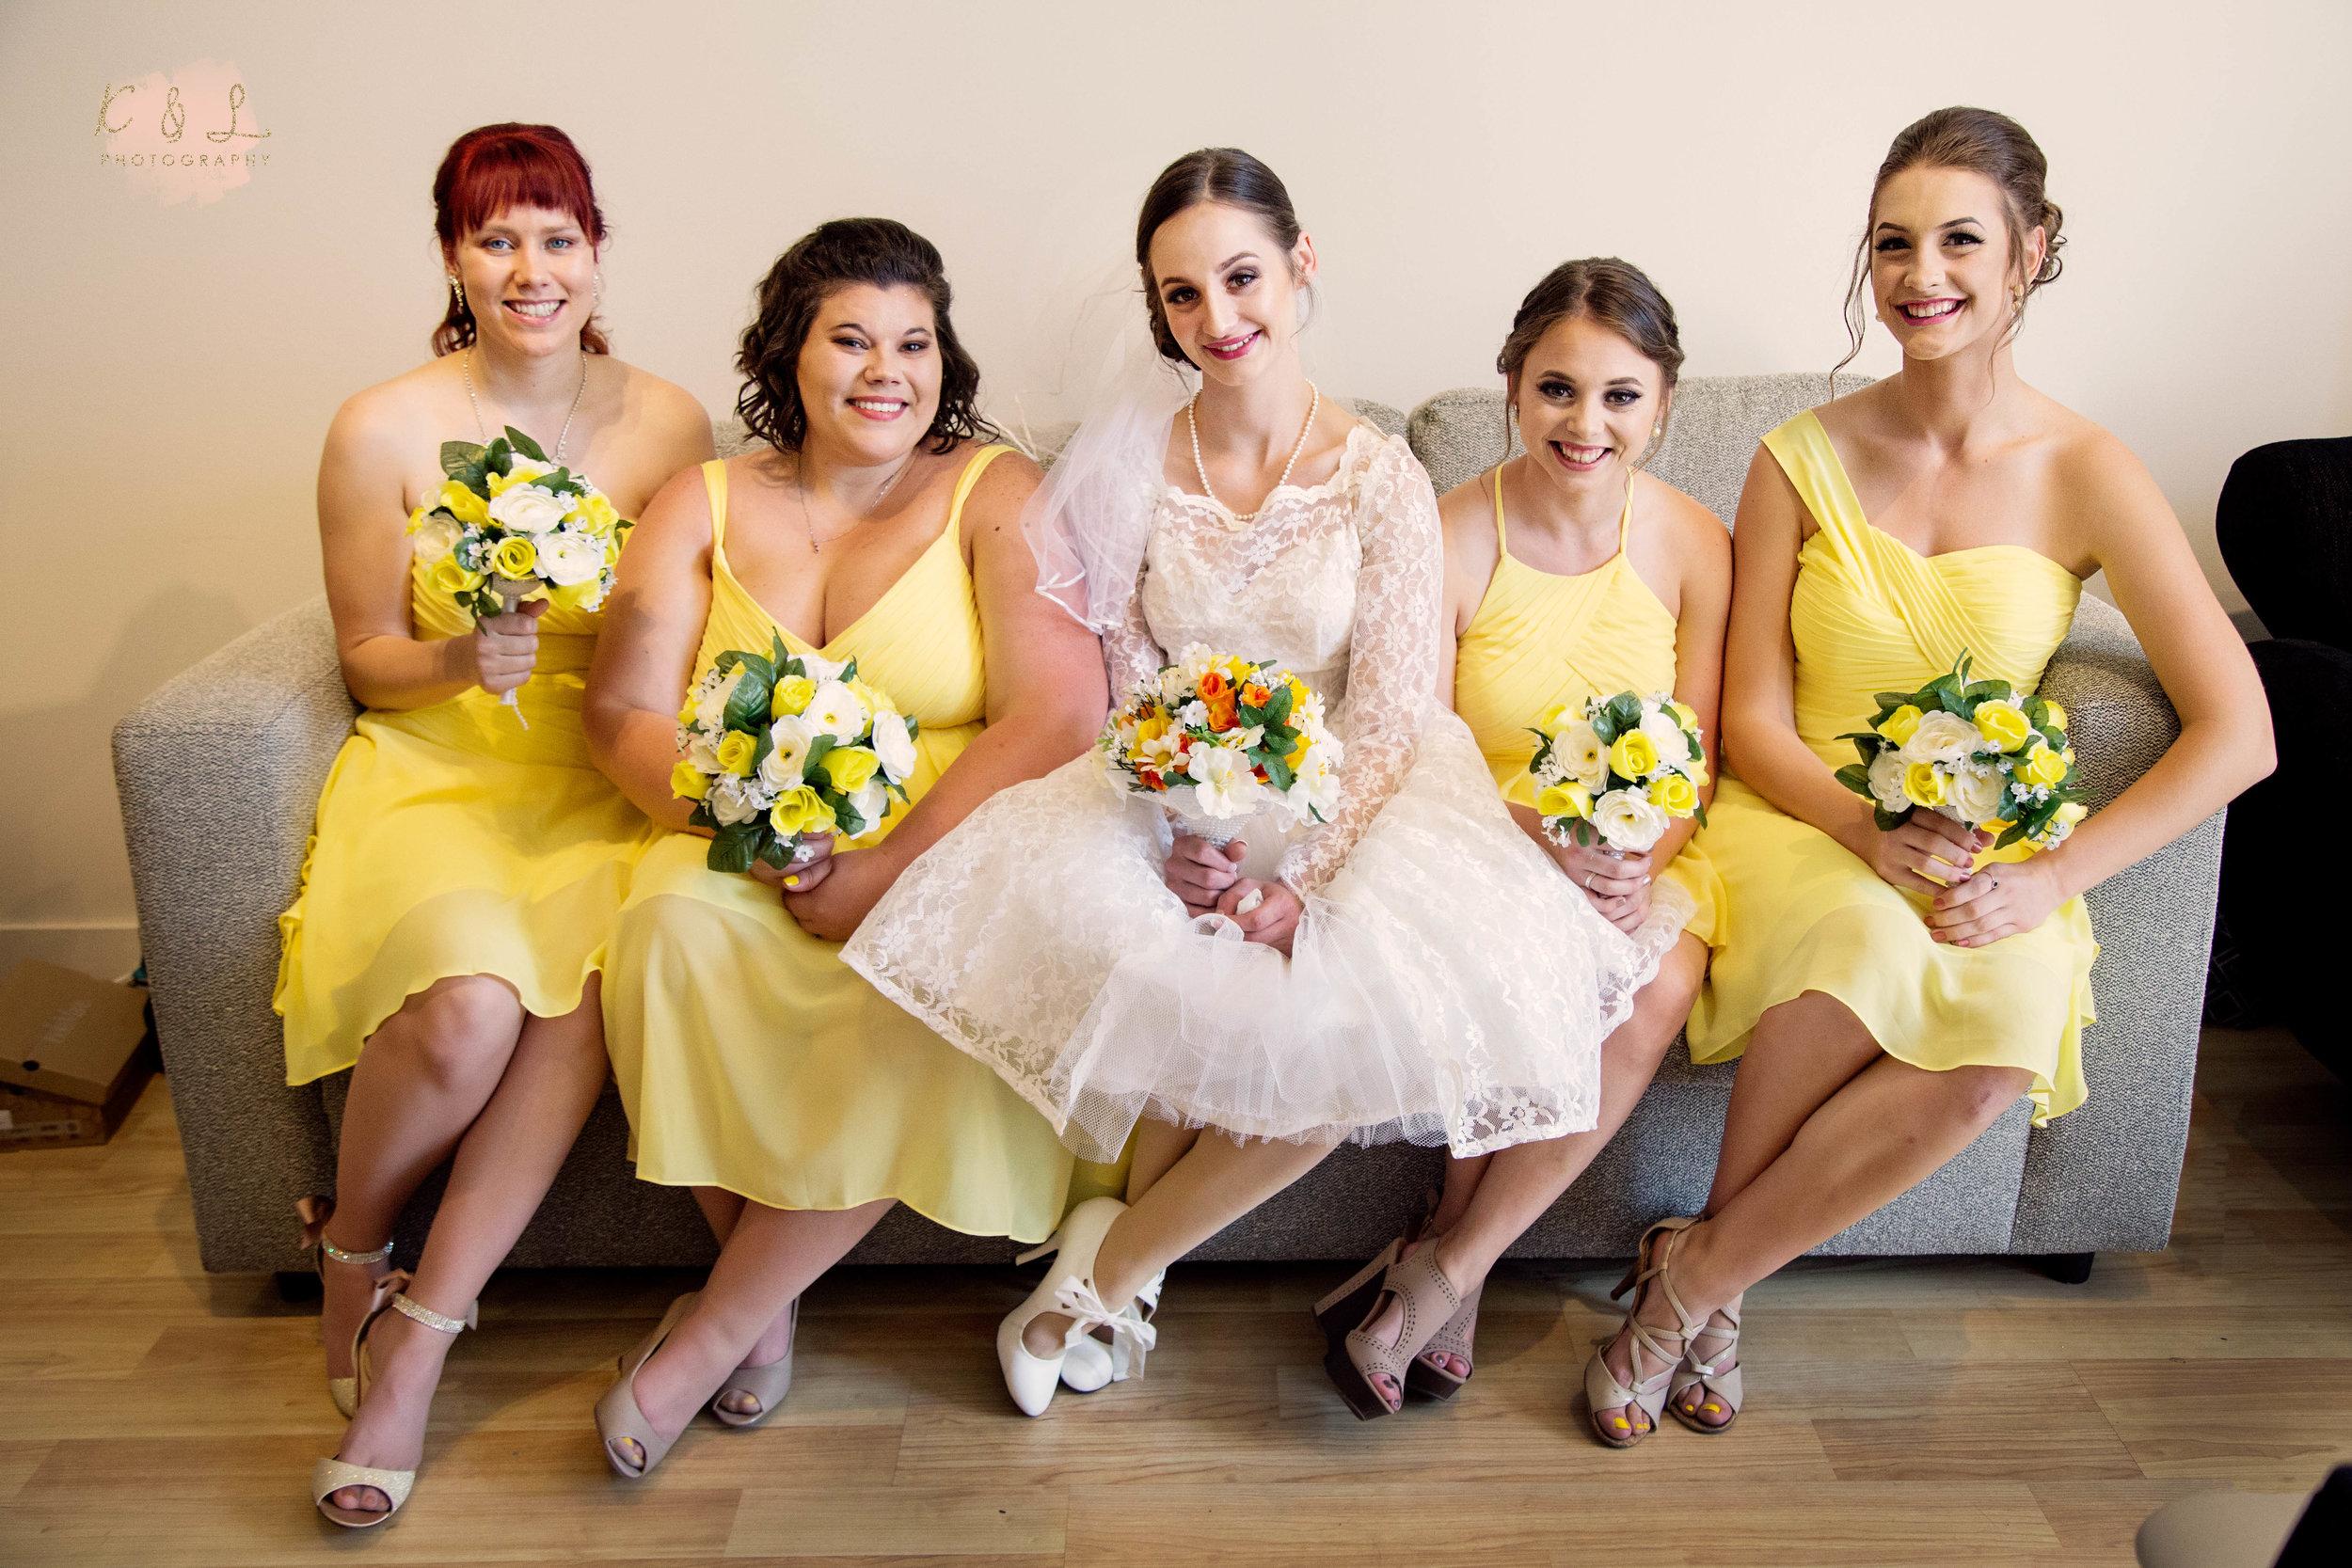 Mathia_Wedding_2017-13.jpg